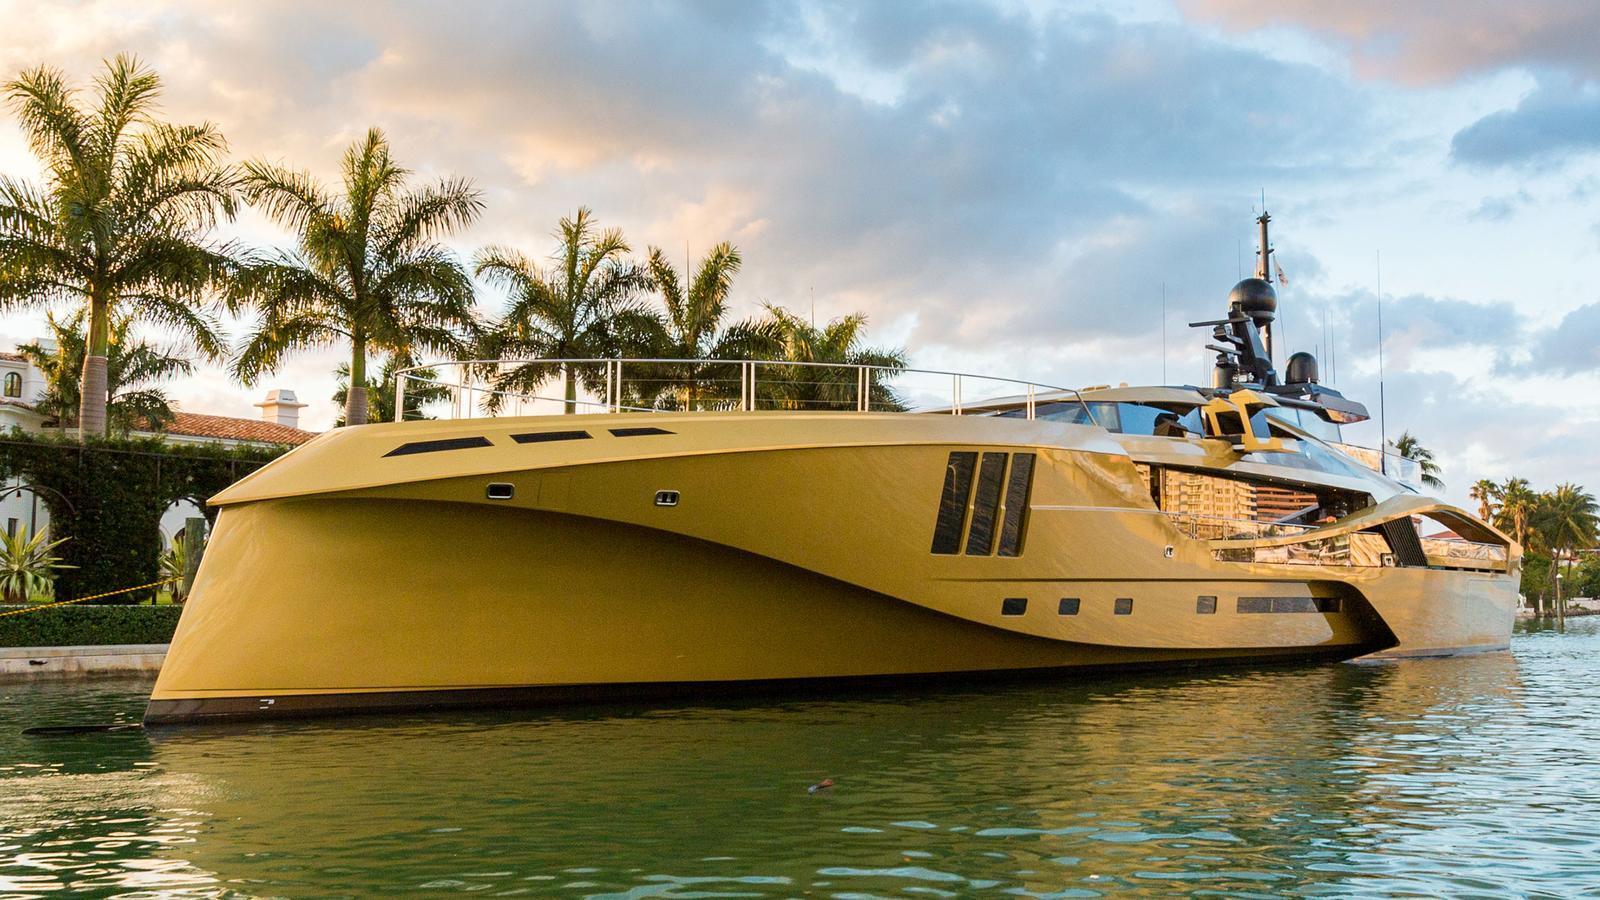 khaliha-motor-yacht-palmer-johnson-super-sport-48-2014-49m-moored-bow